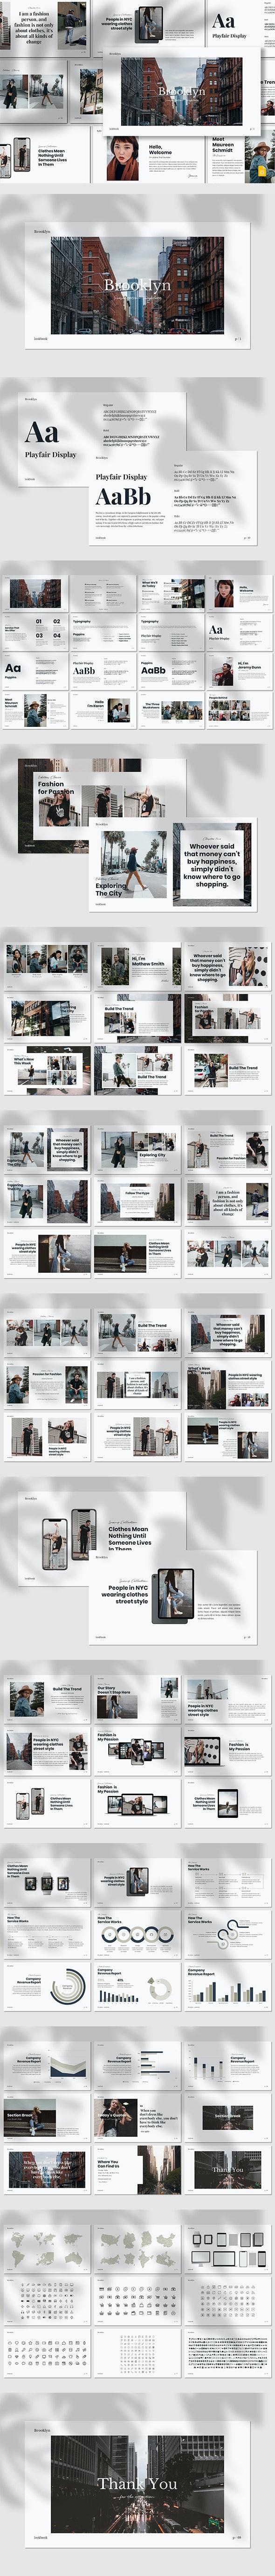 Brooklyn - Lookbook Google Slides Template - Google Slides Presentation Templates